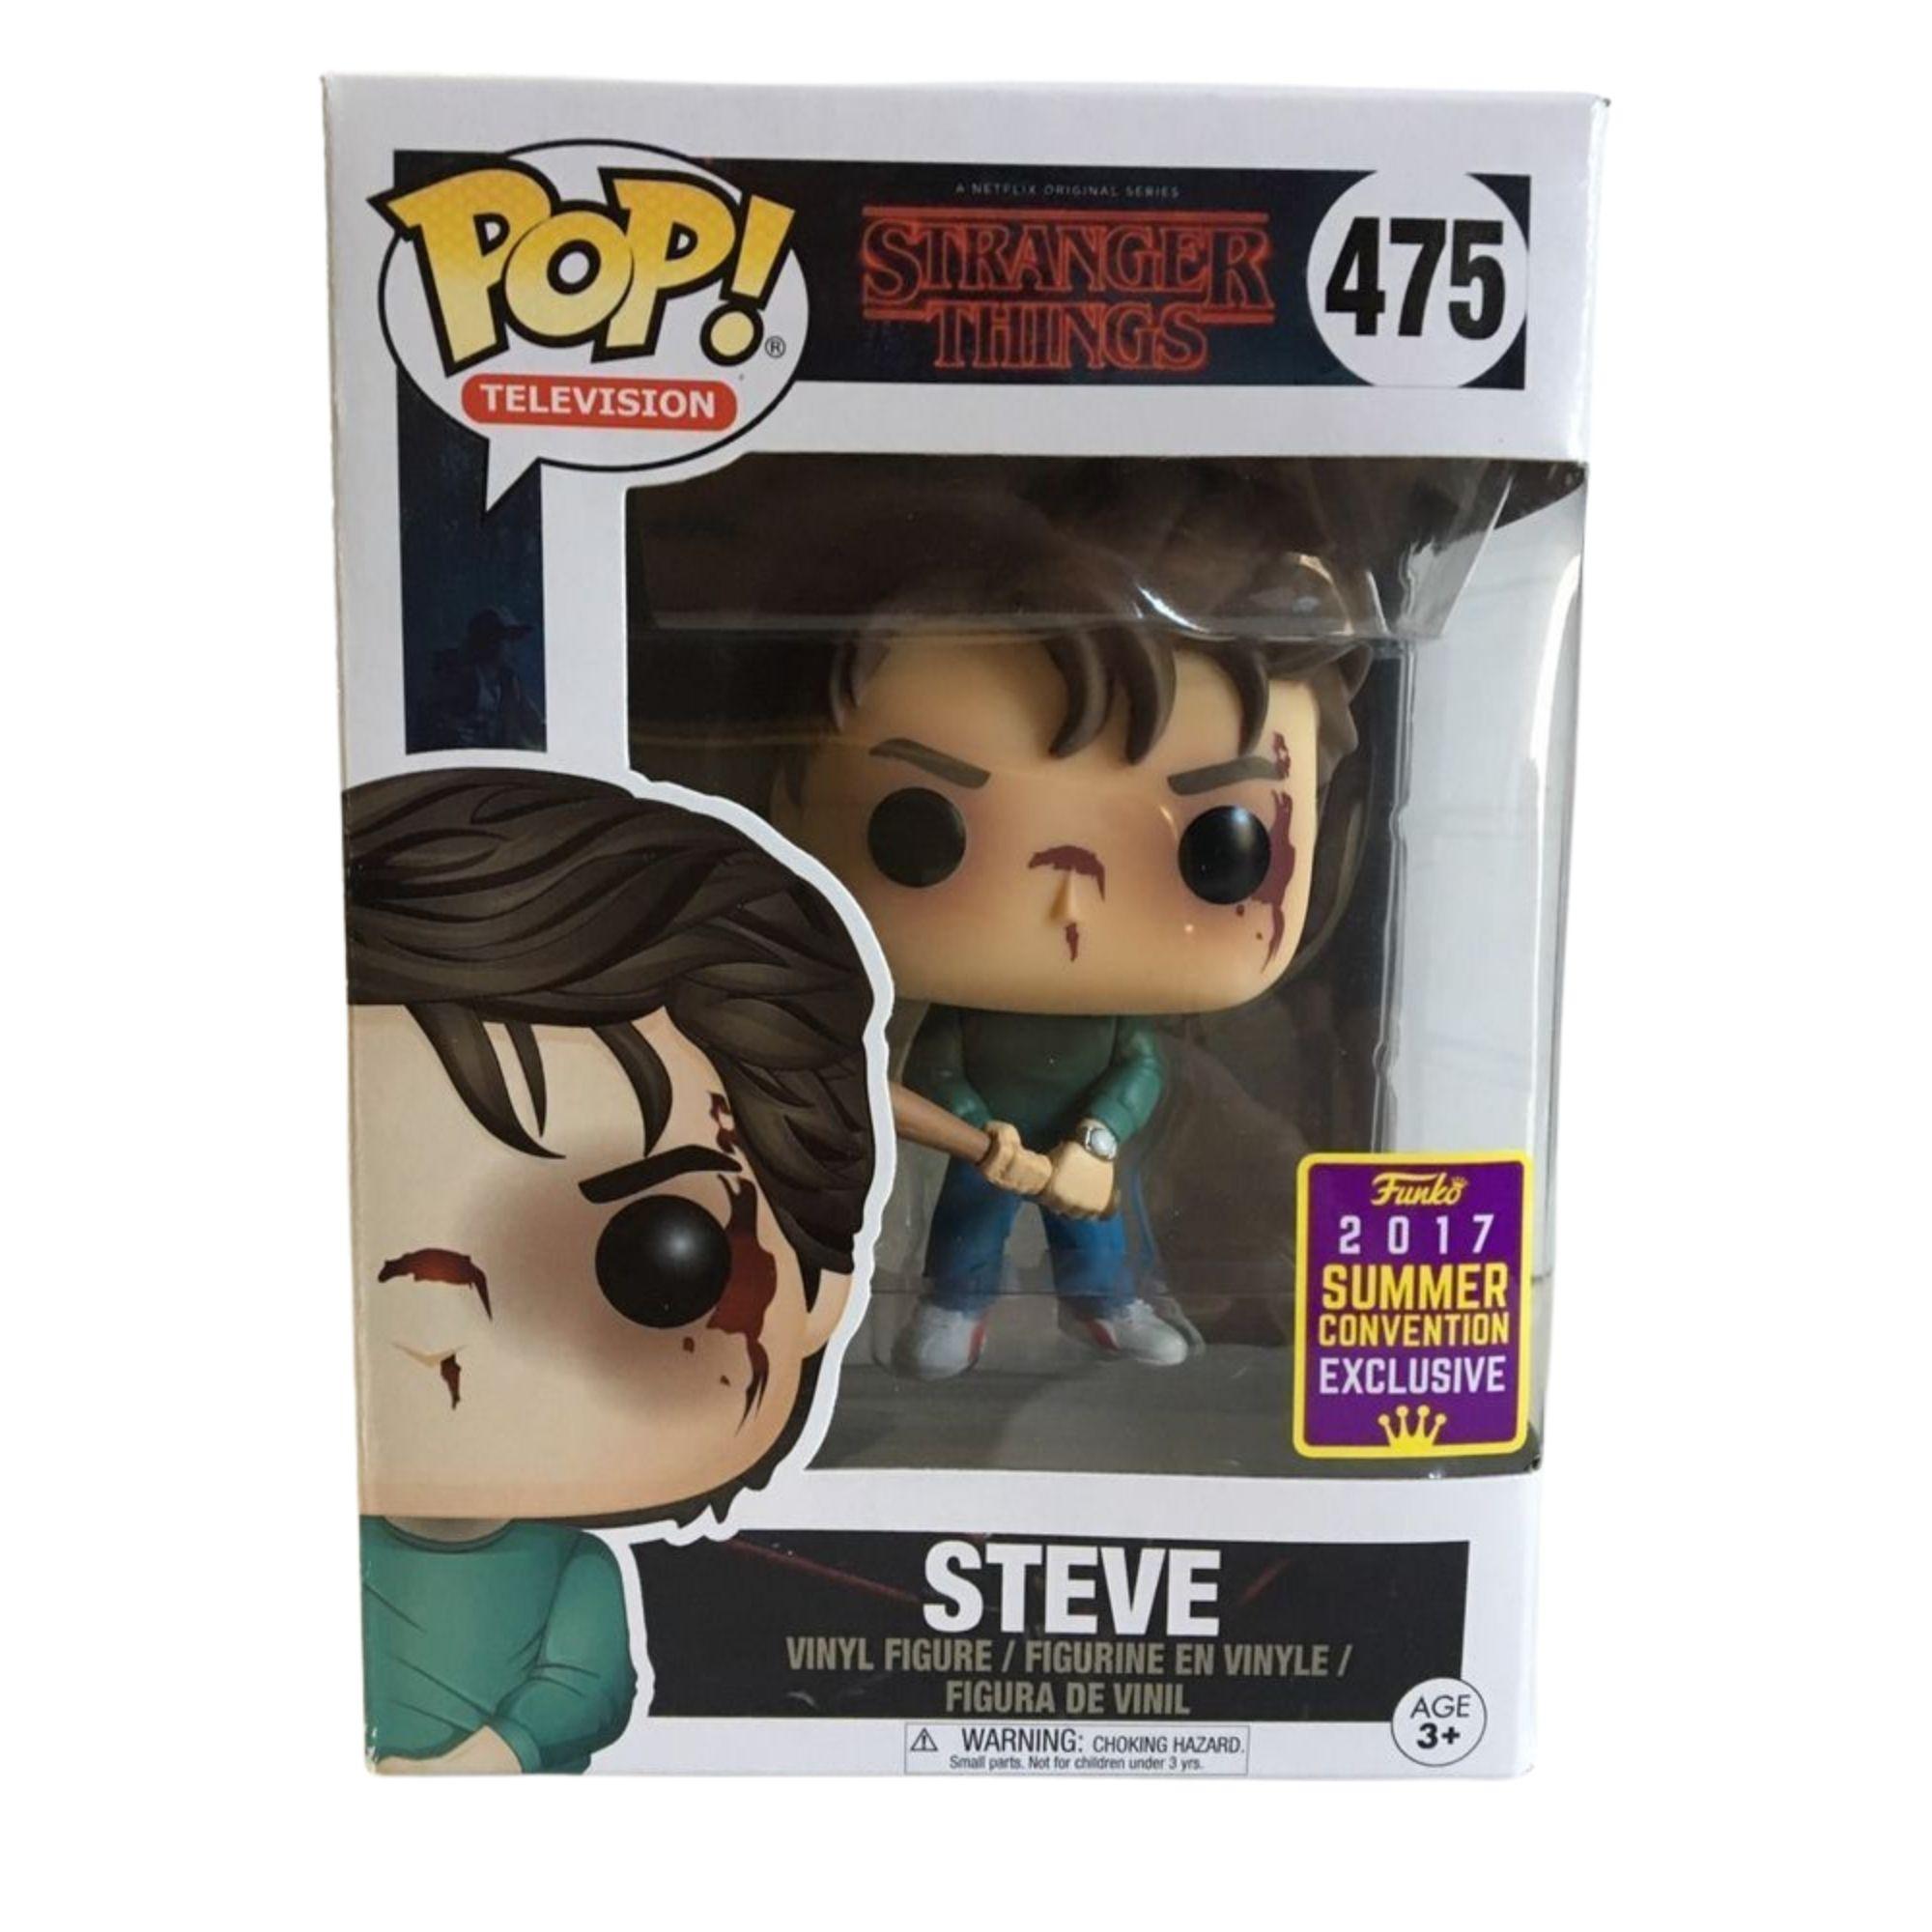 Funko Pop Stranger Things Steve Exclusivo Sdcc #475  - Game Land Brinquedos